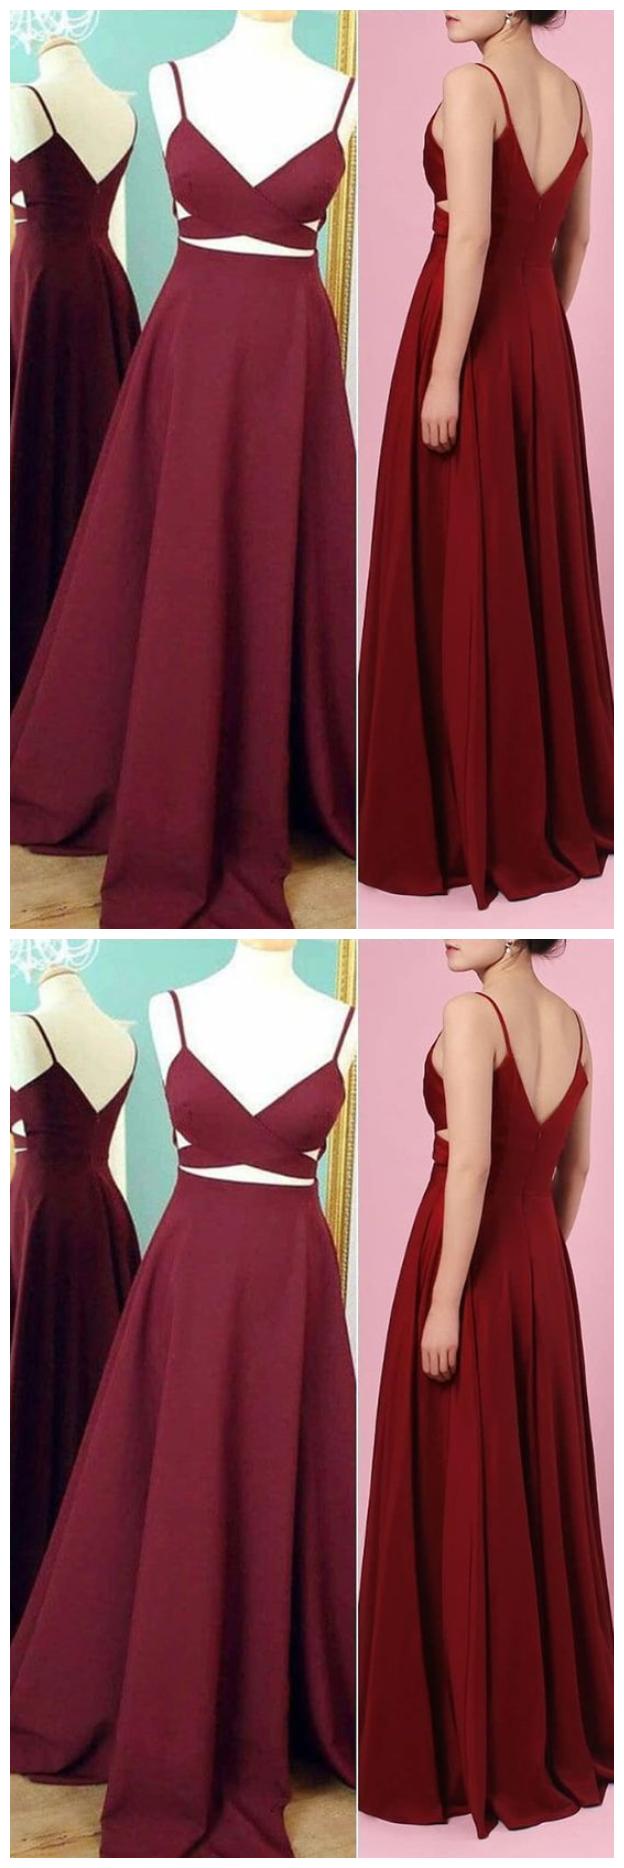 burgundy prom dress, 2020 simple prom dress